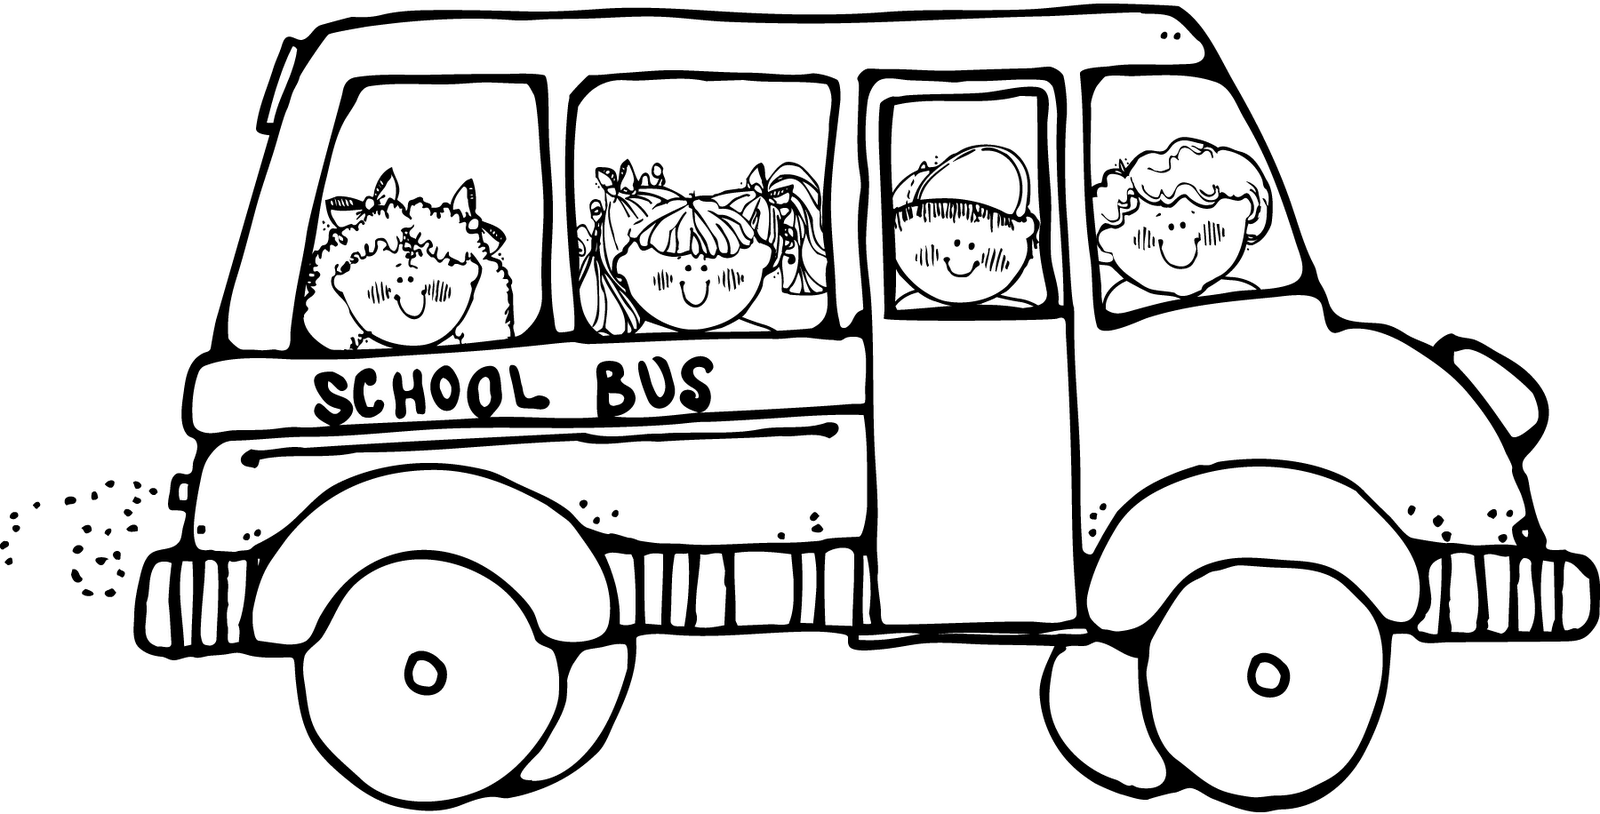 School Bus Clip Art Black And White